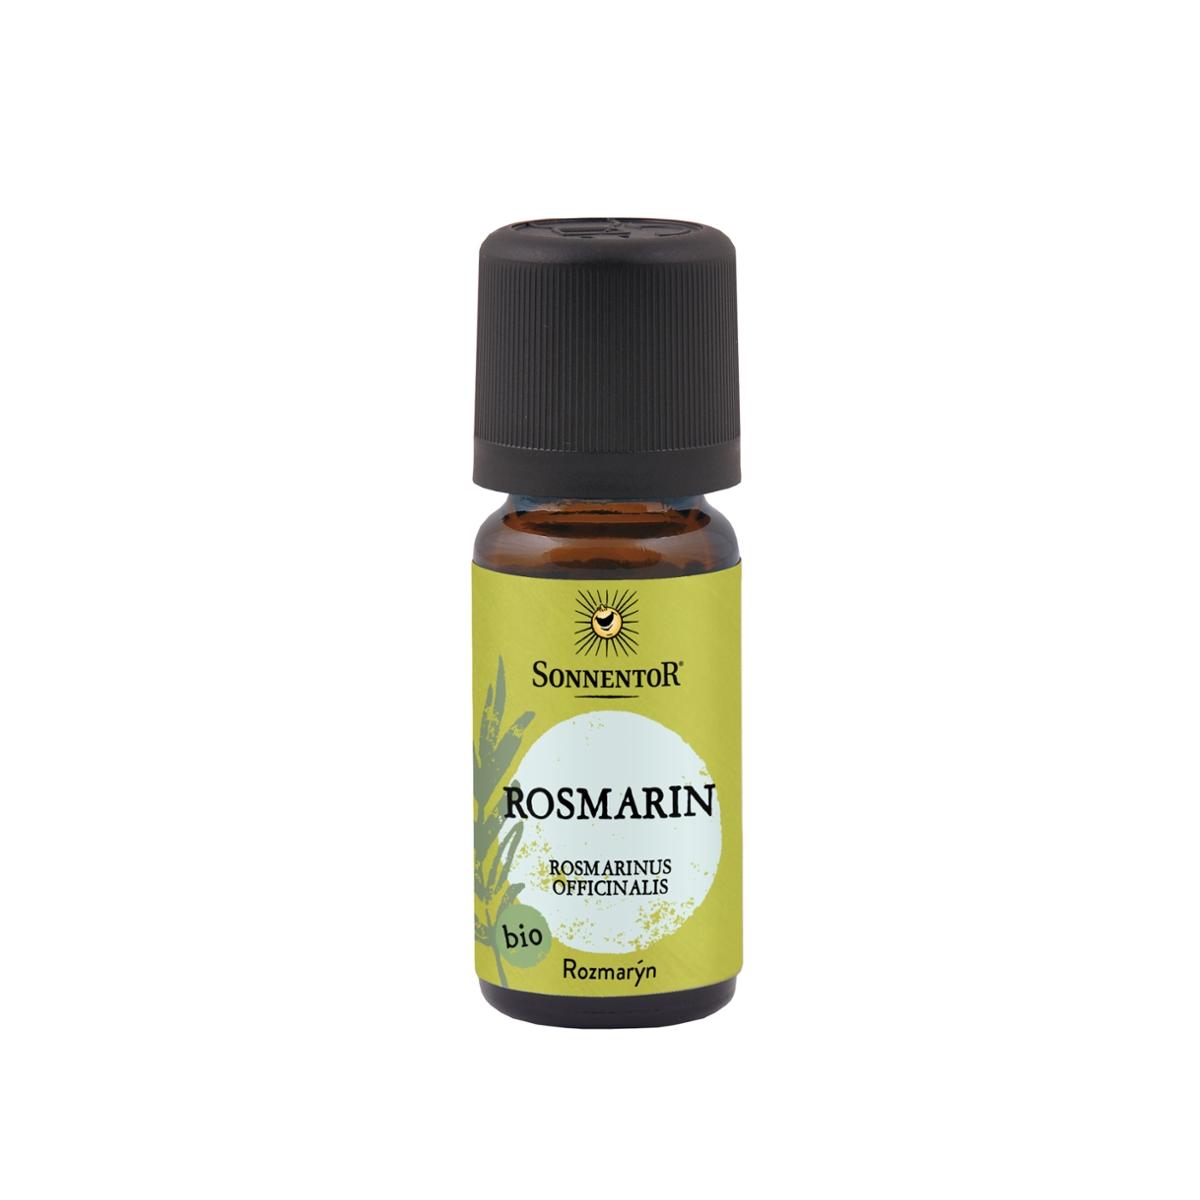 Rosmarin ätherisches Öl